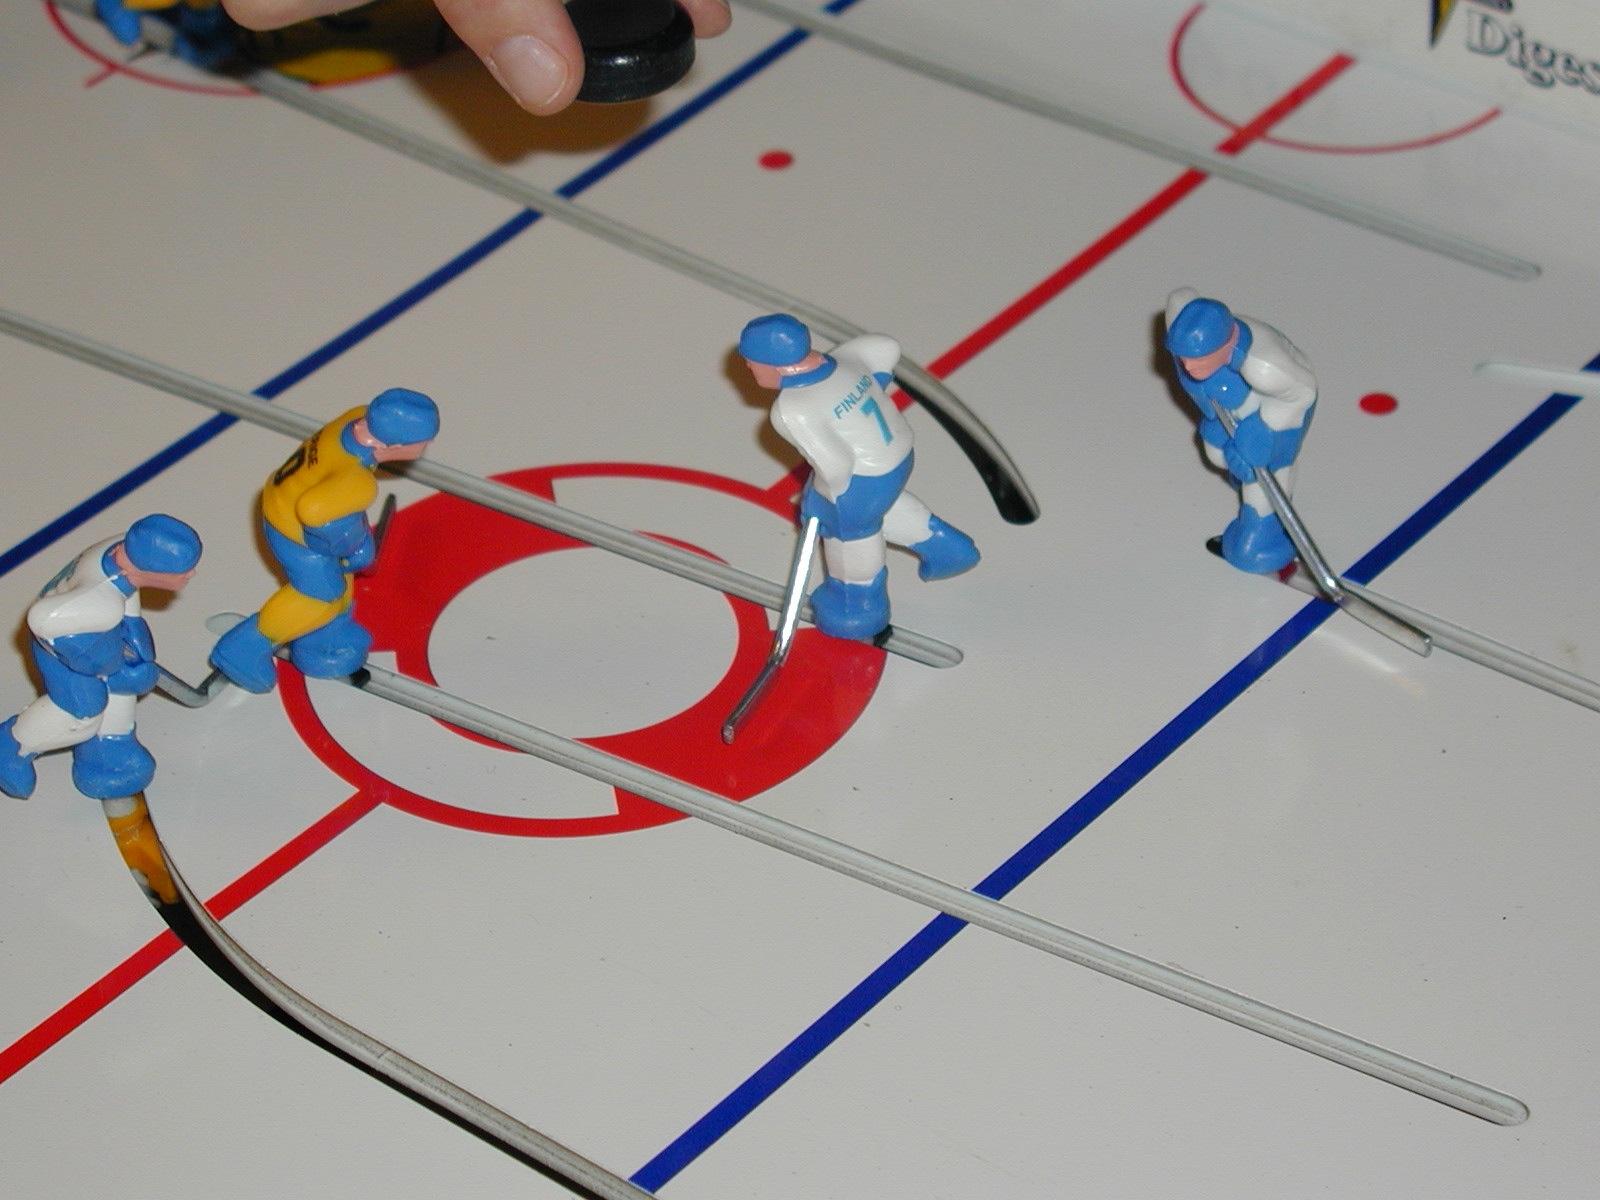 Table hockey face-off